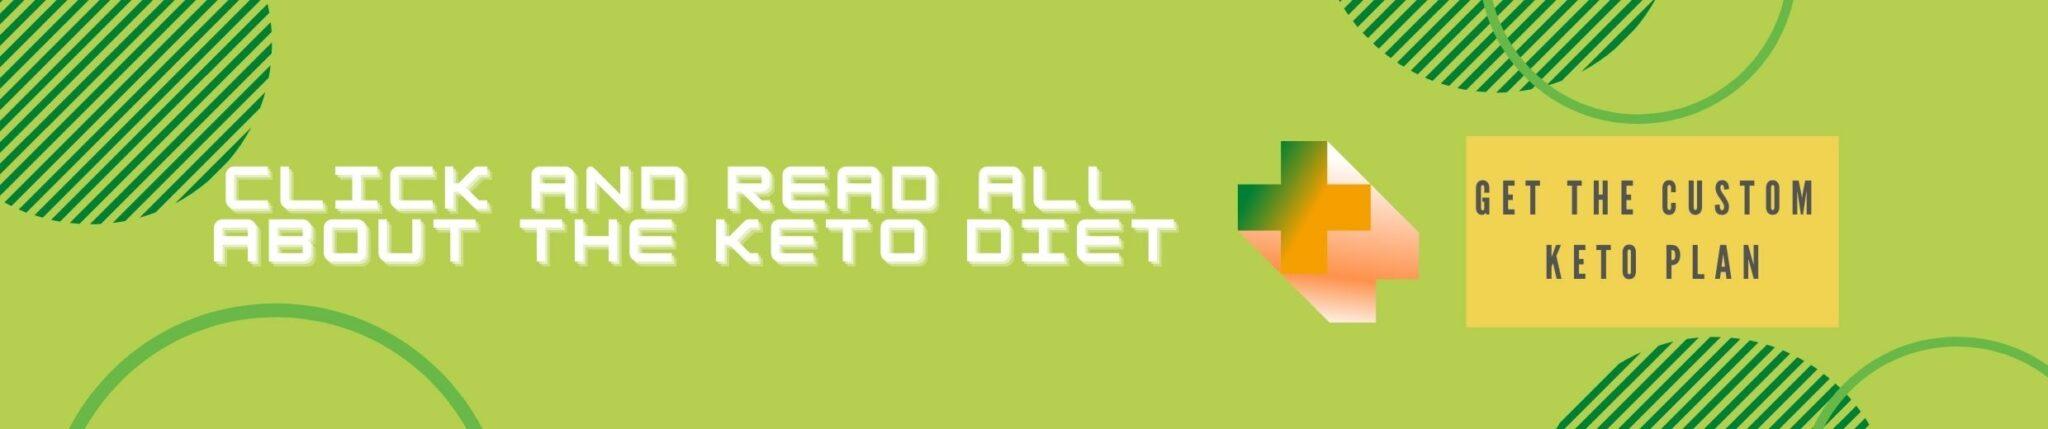 Keto Diet Meals and Recipes - CTA